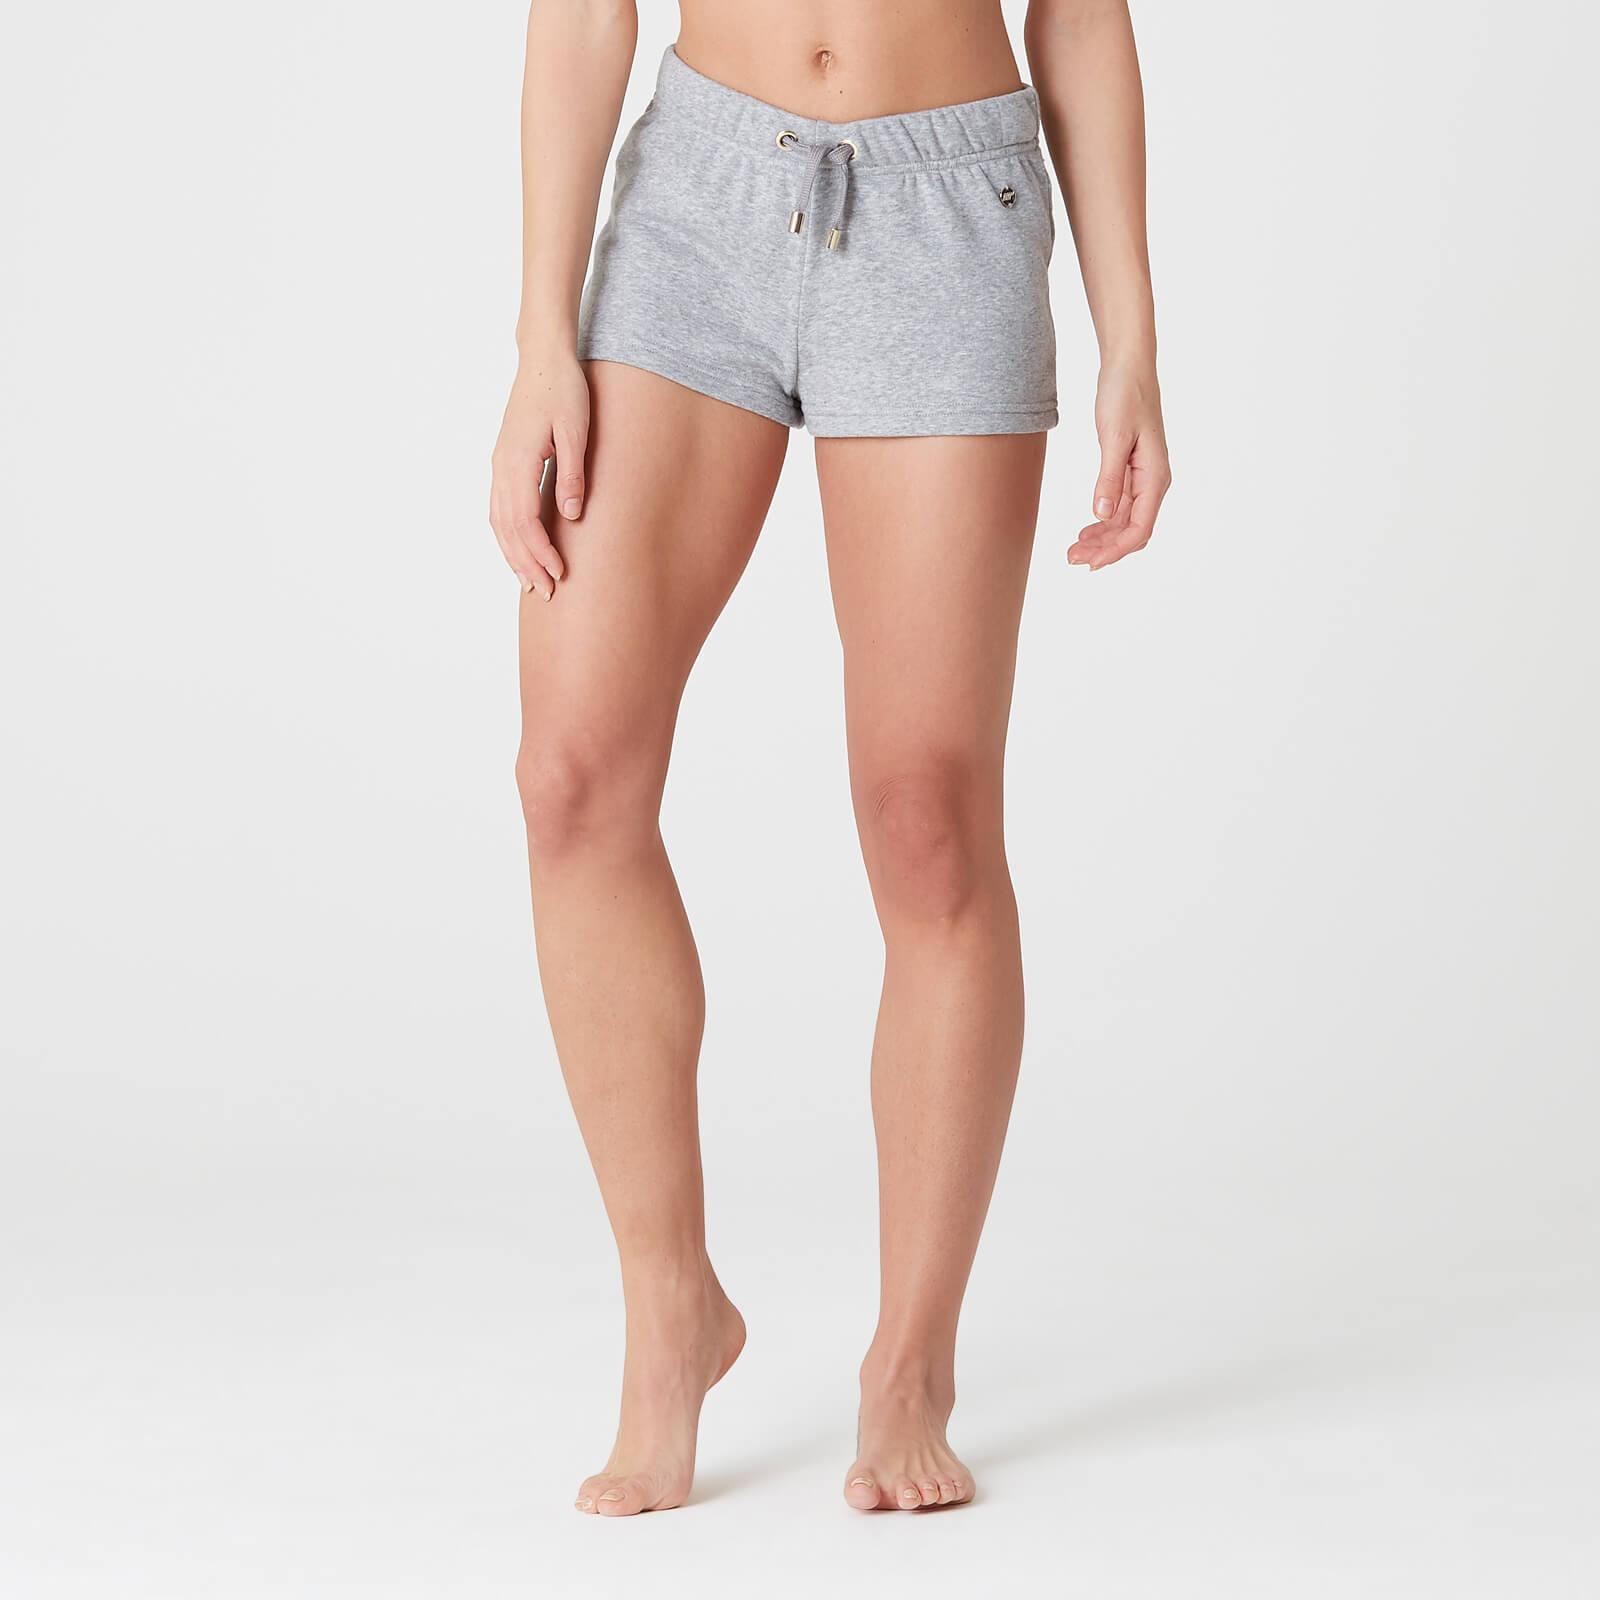 Myprotein Luxe Lounge Shorts - Grey Marl - M